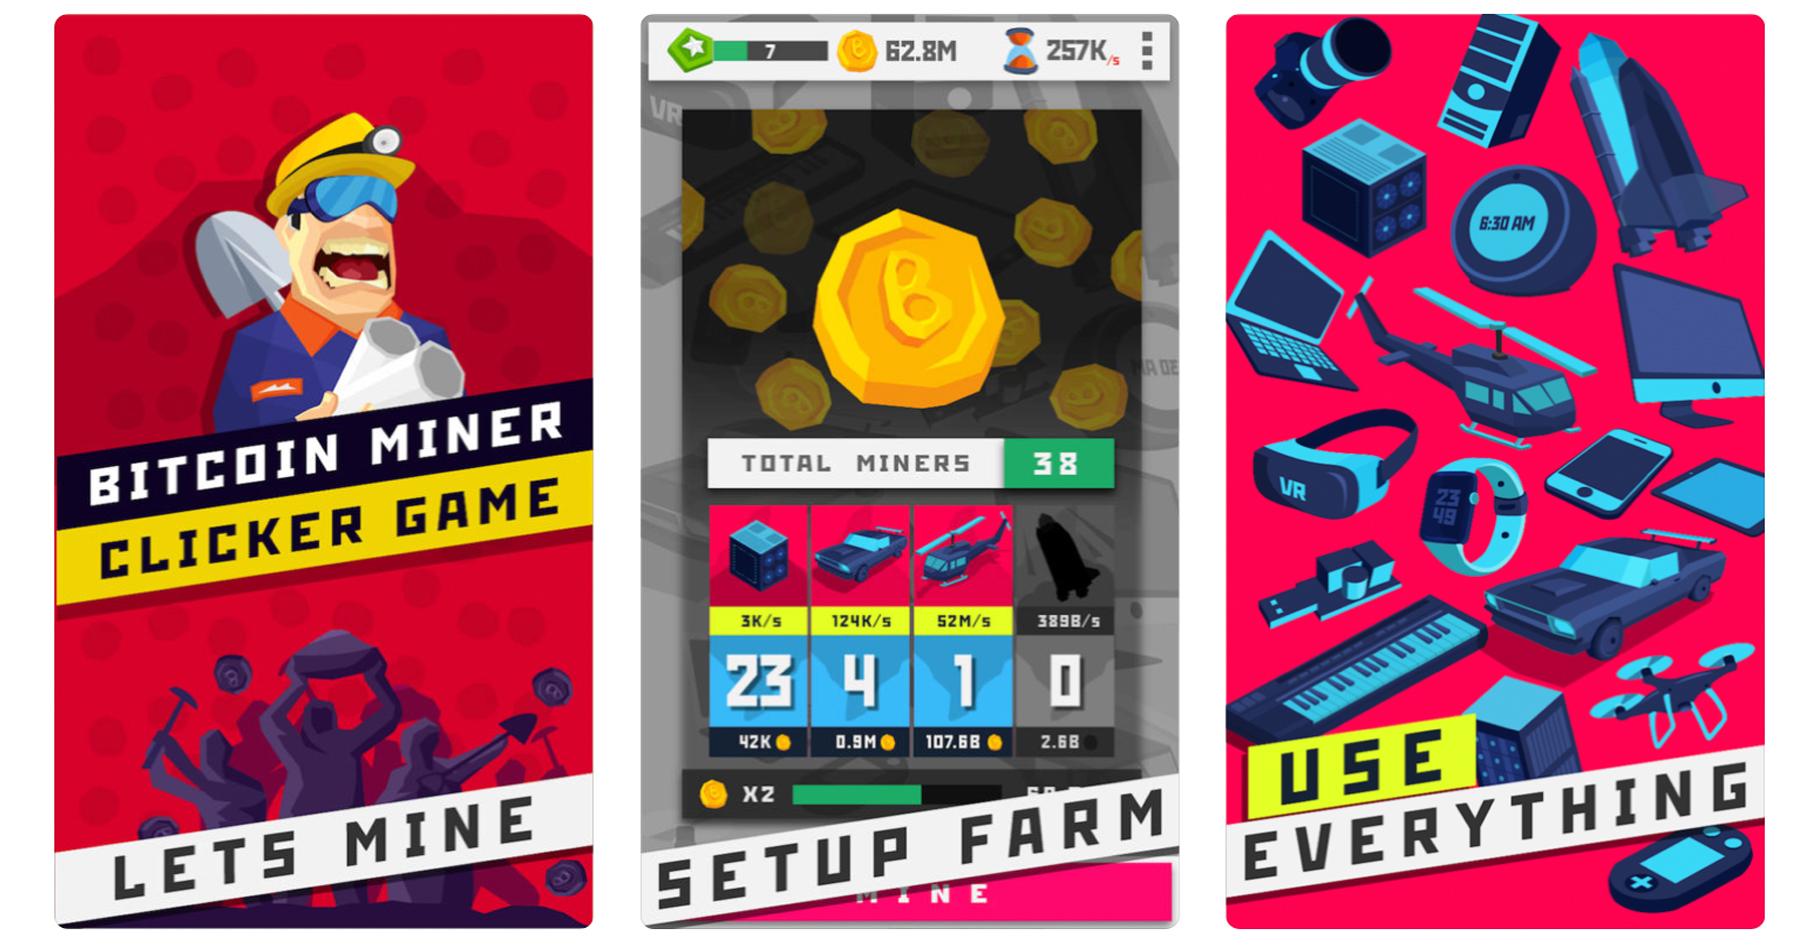 Bitcoin Miner: Clicker Game